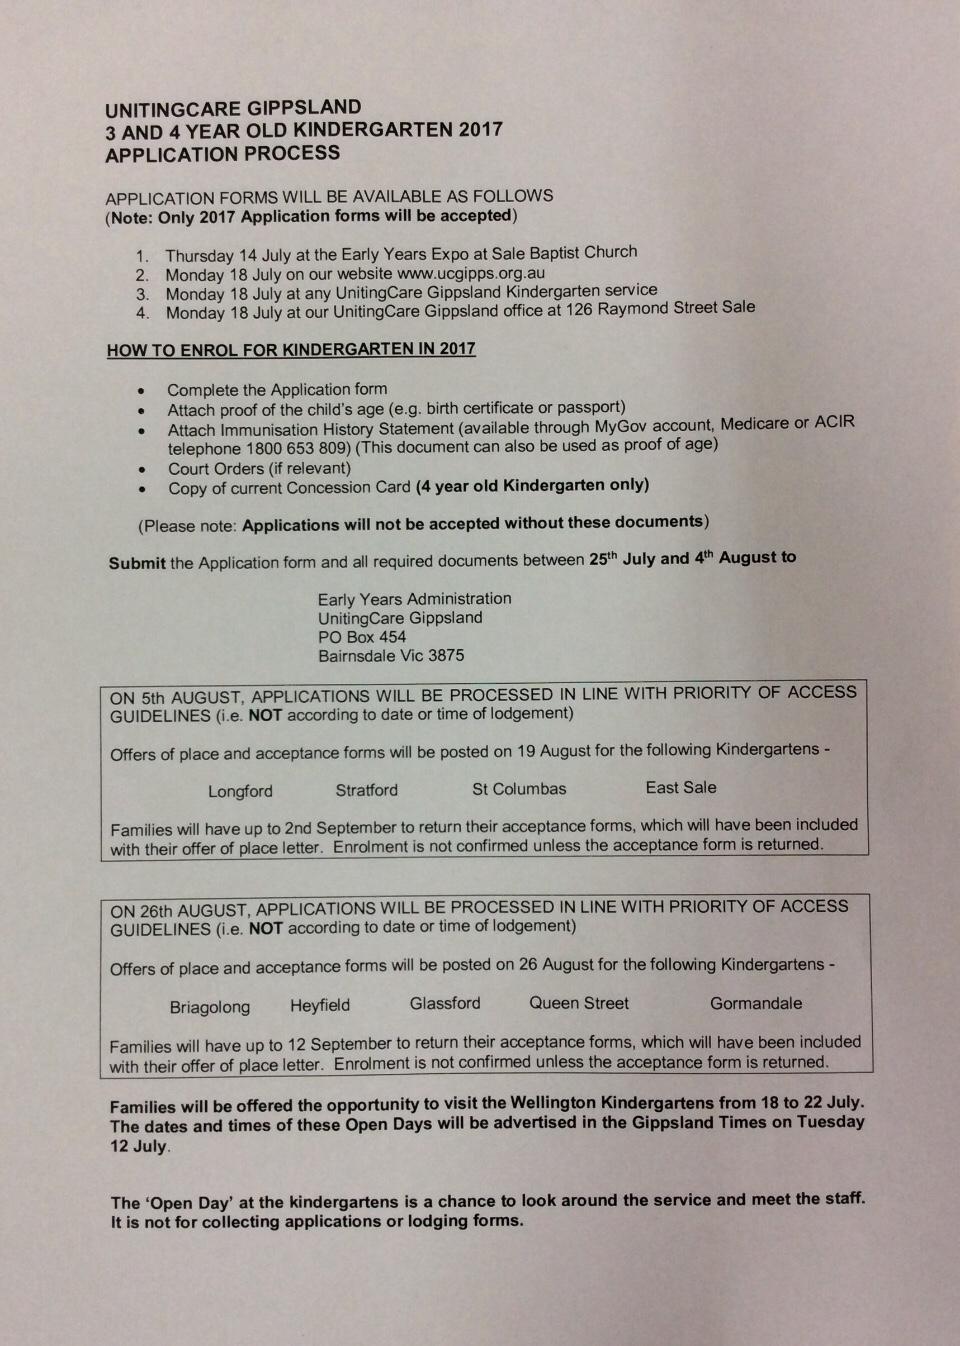 East sale kindergarten 2017 application process priority of access falaconquin